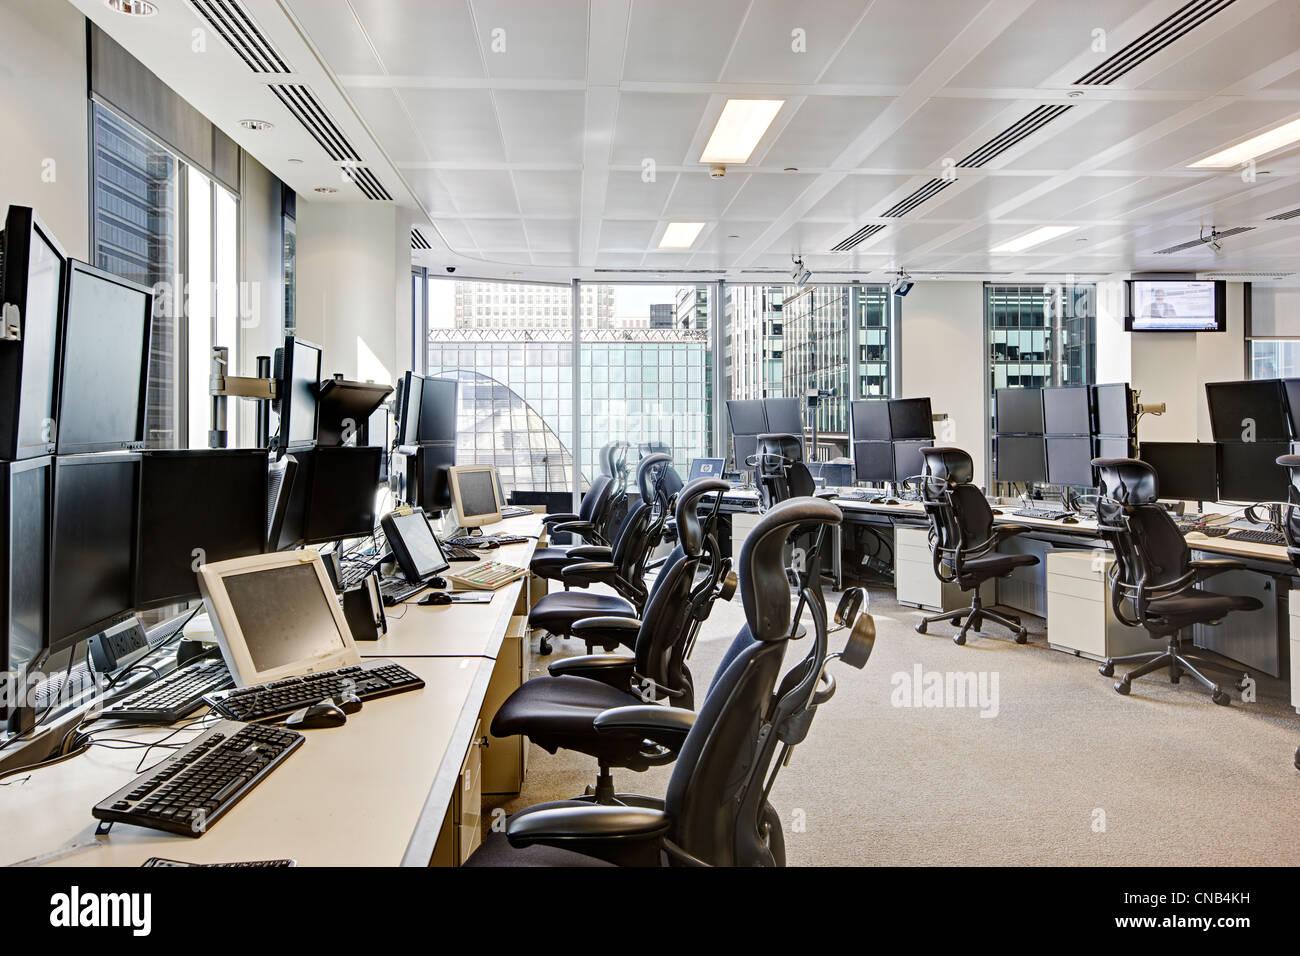 trading desks city London Canary Wharf office bank - Stock Image